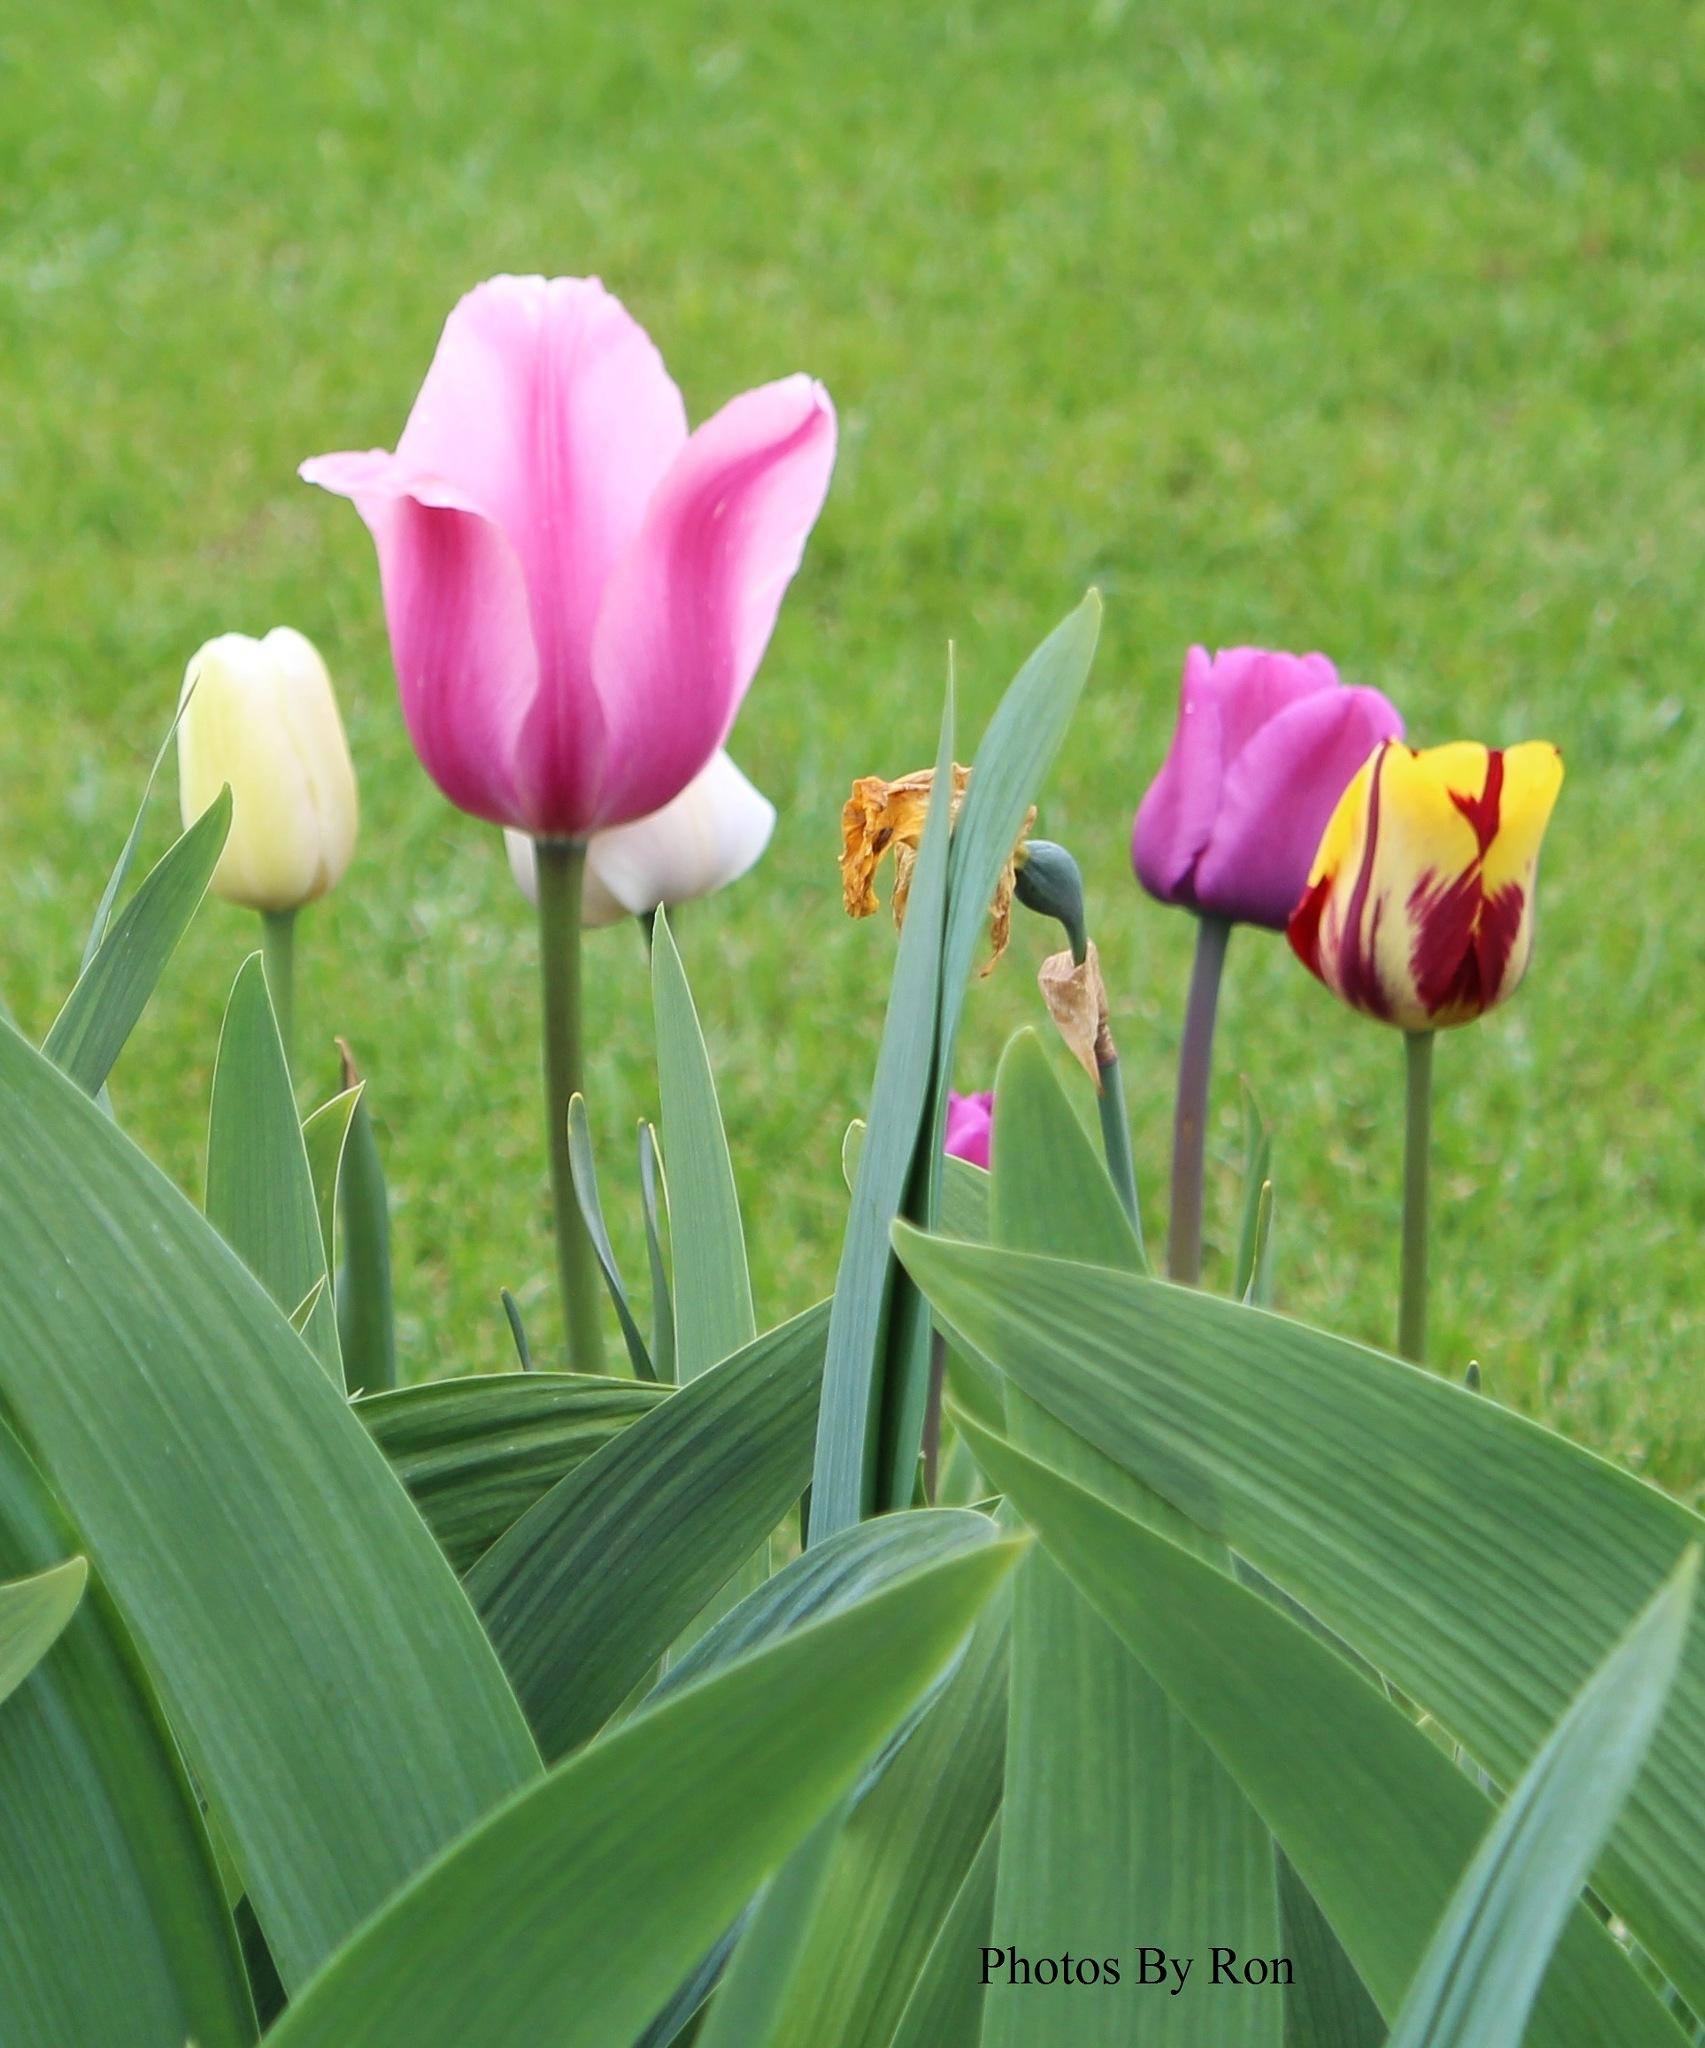 """Tulip Assortment"" by Ron Berkley"